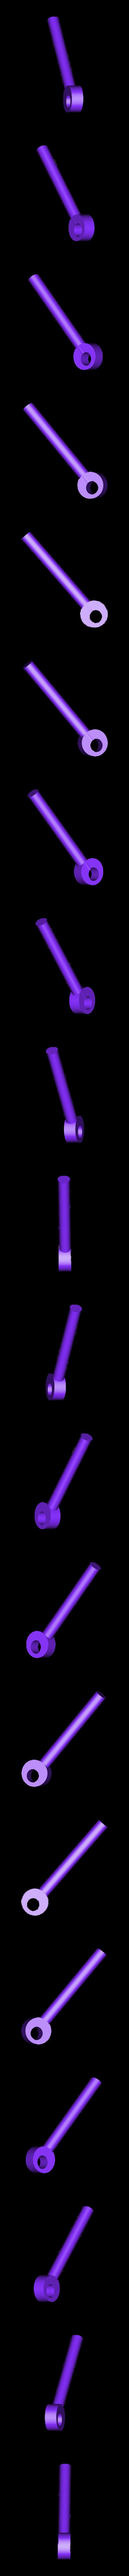 veer-achtboven.stl Download free STL file trick (custom) • 3D printer model, jasperbaudoin